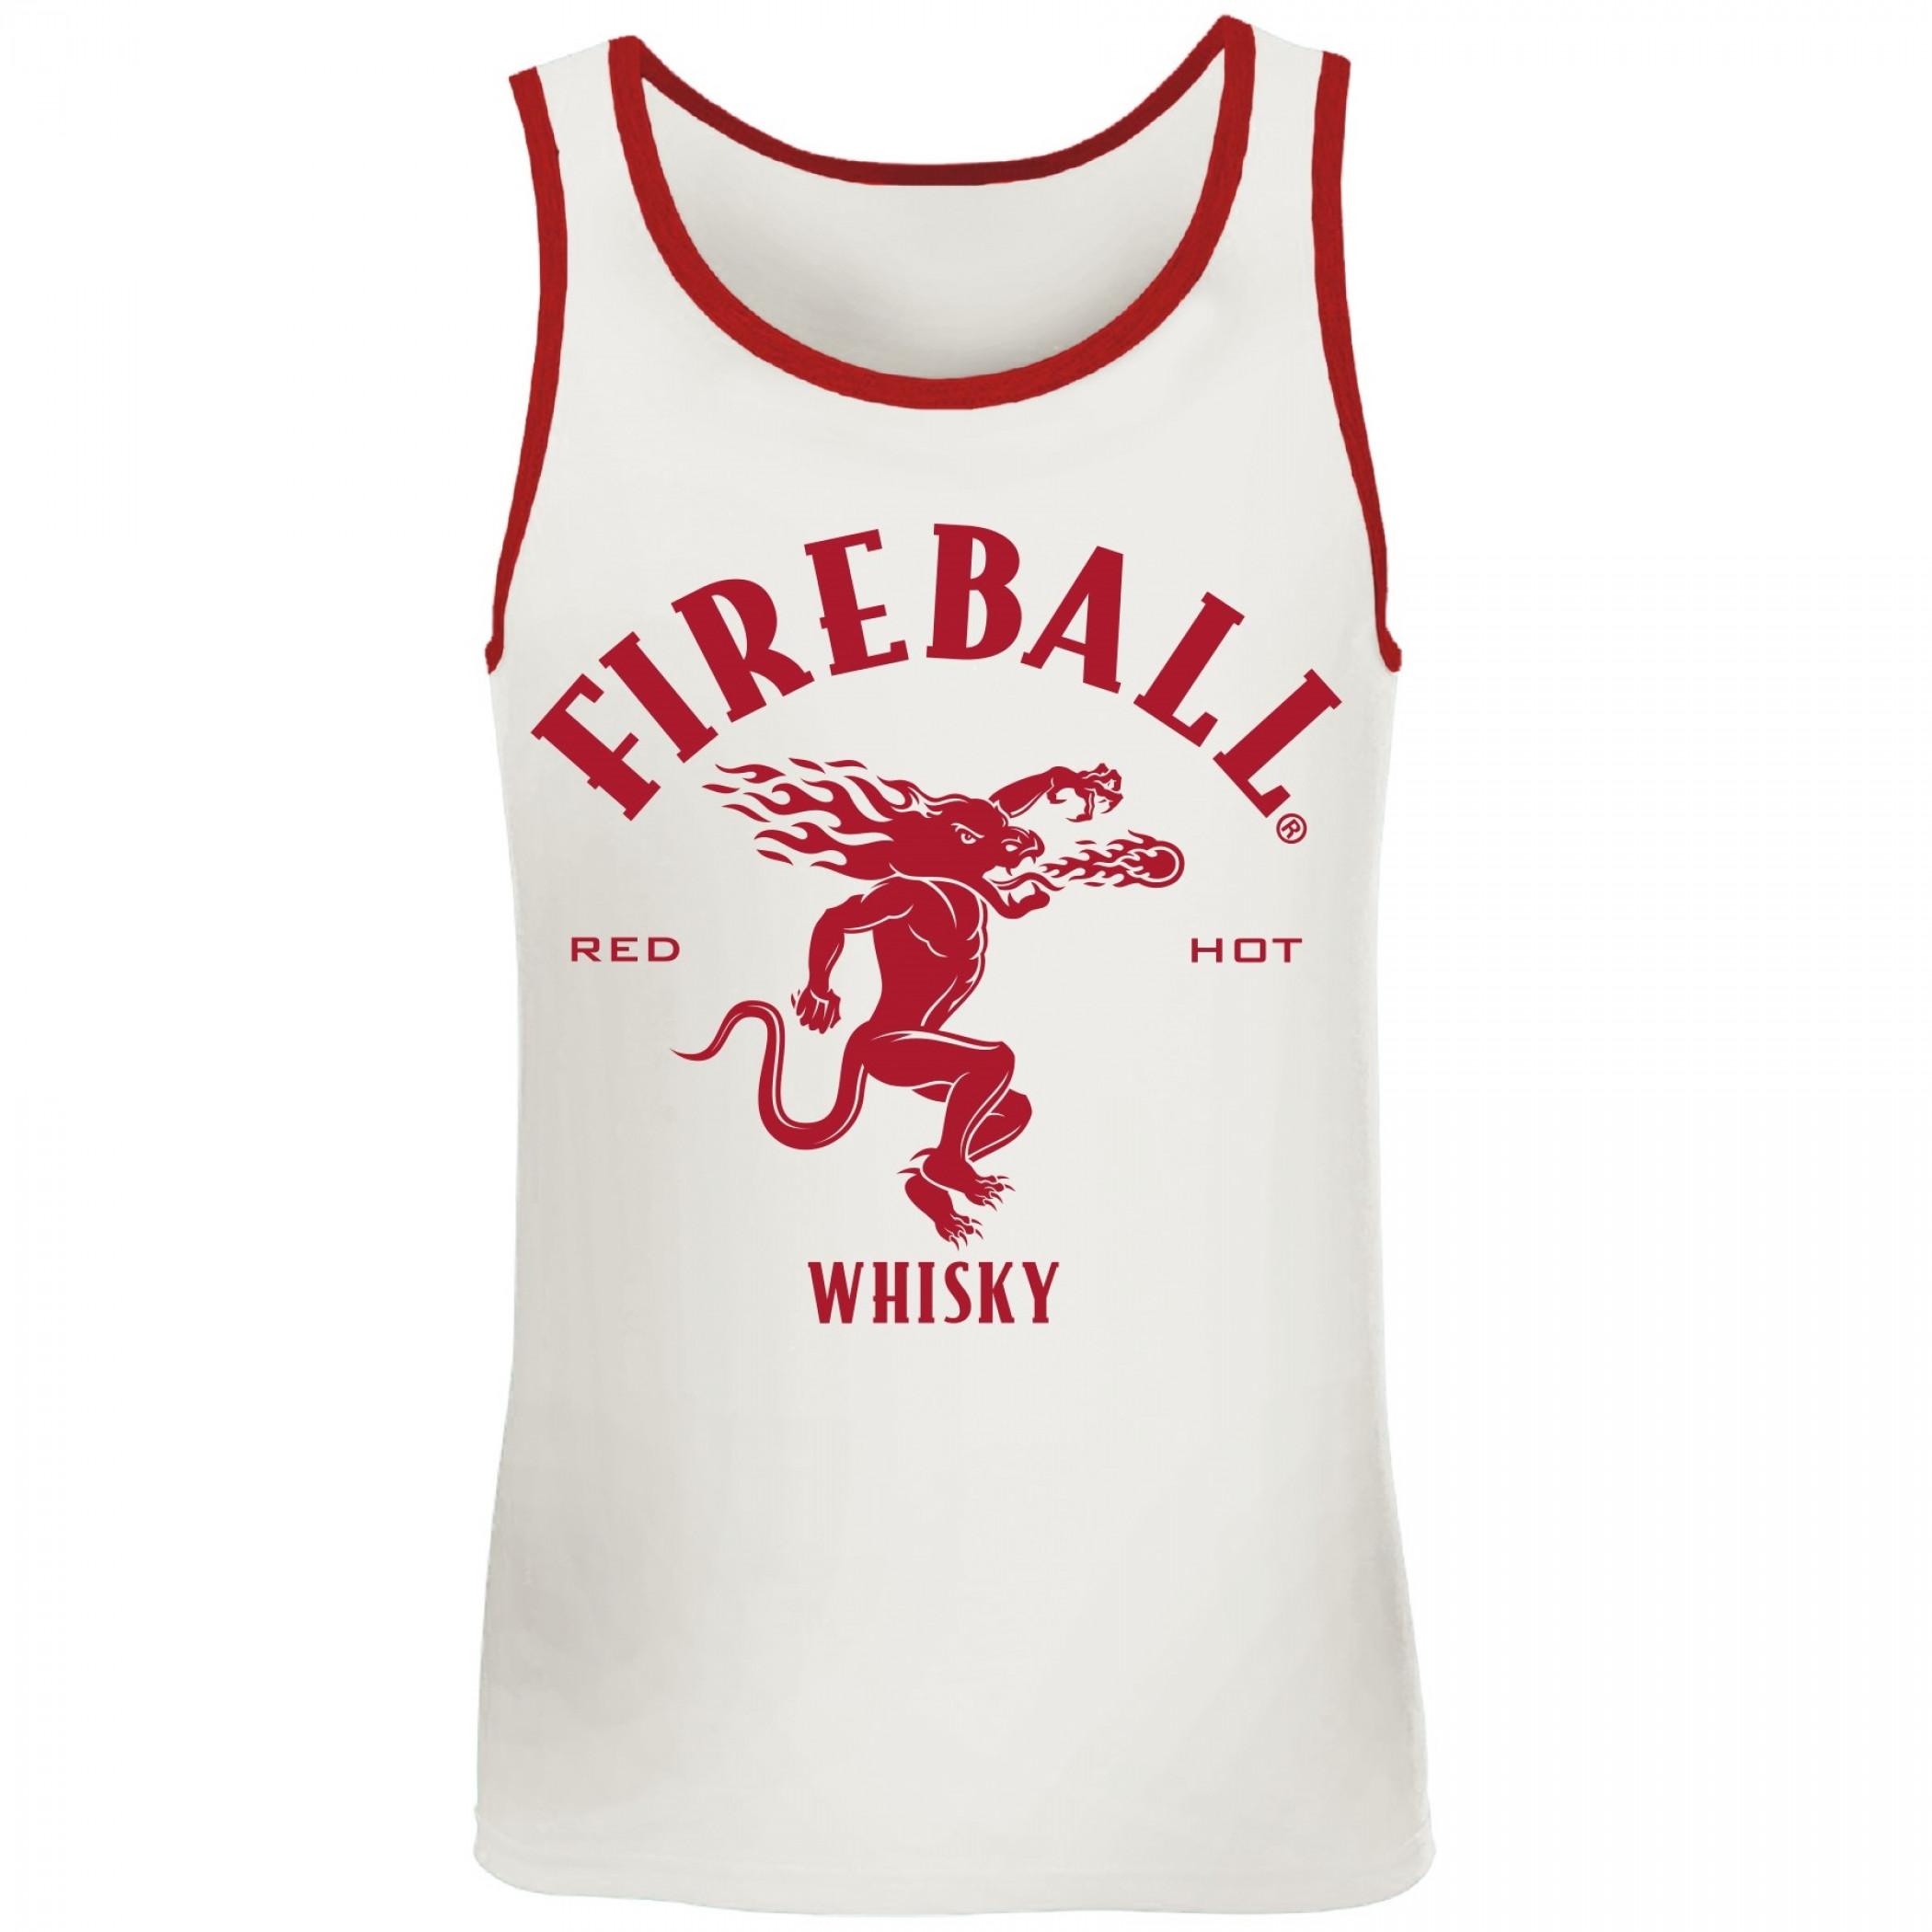 Fireball Whisky Red Trim Tank Top